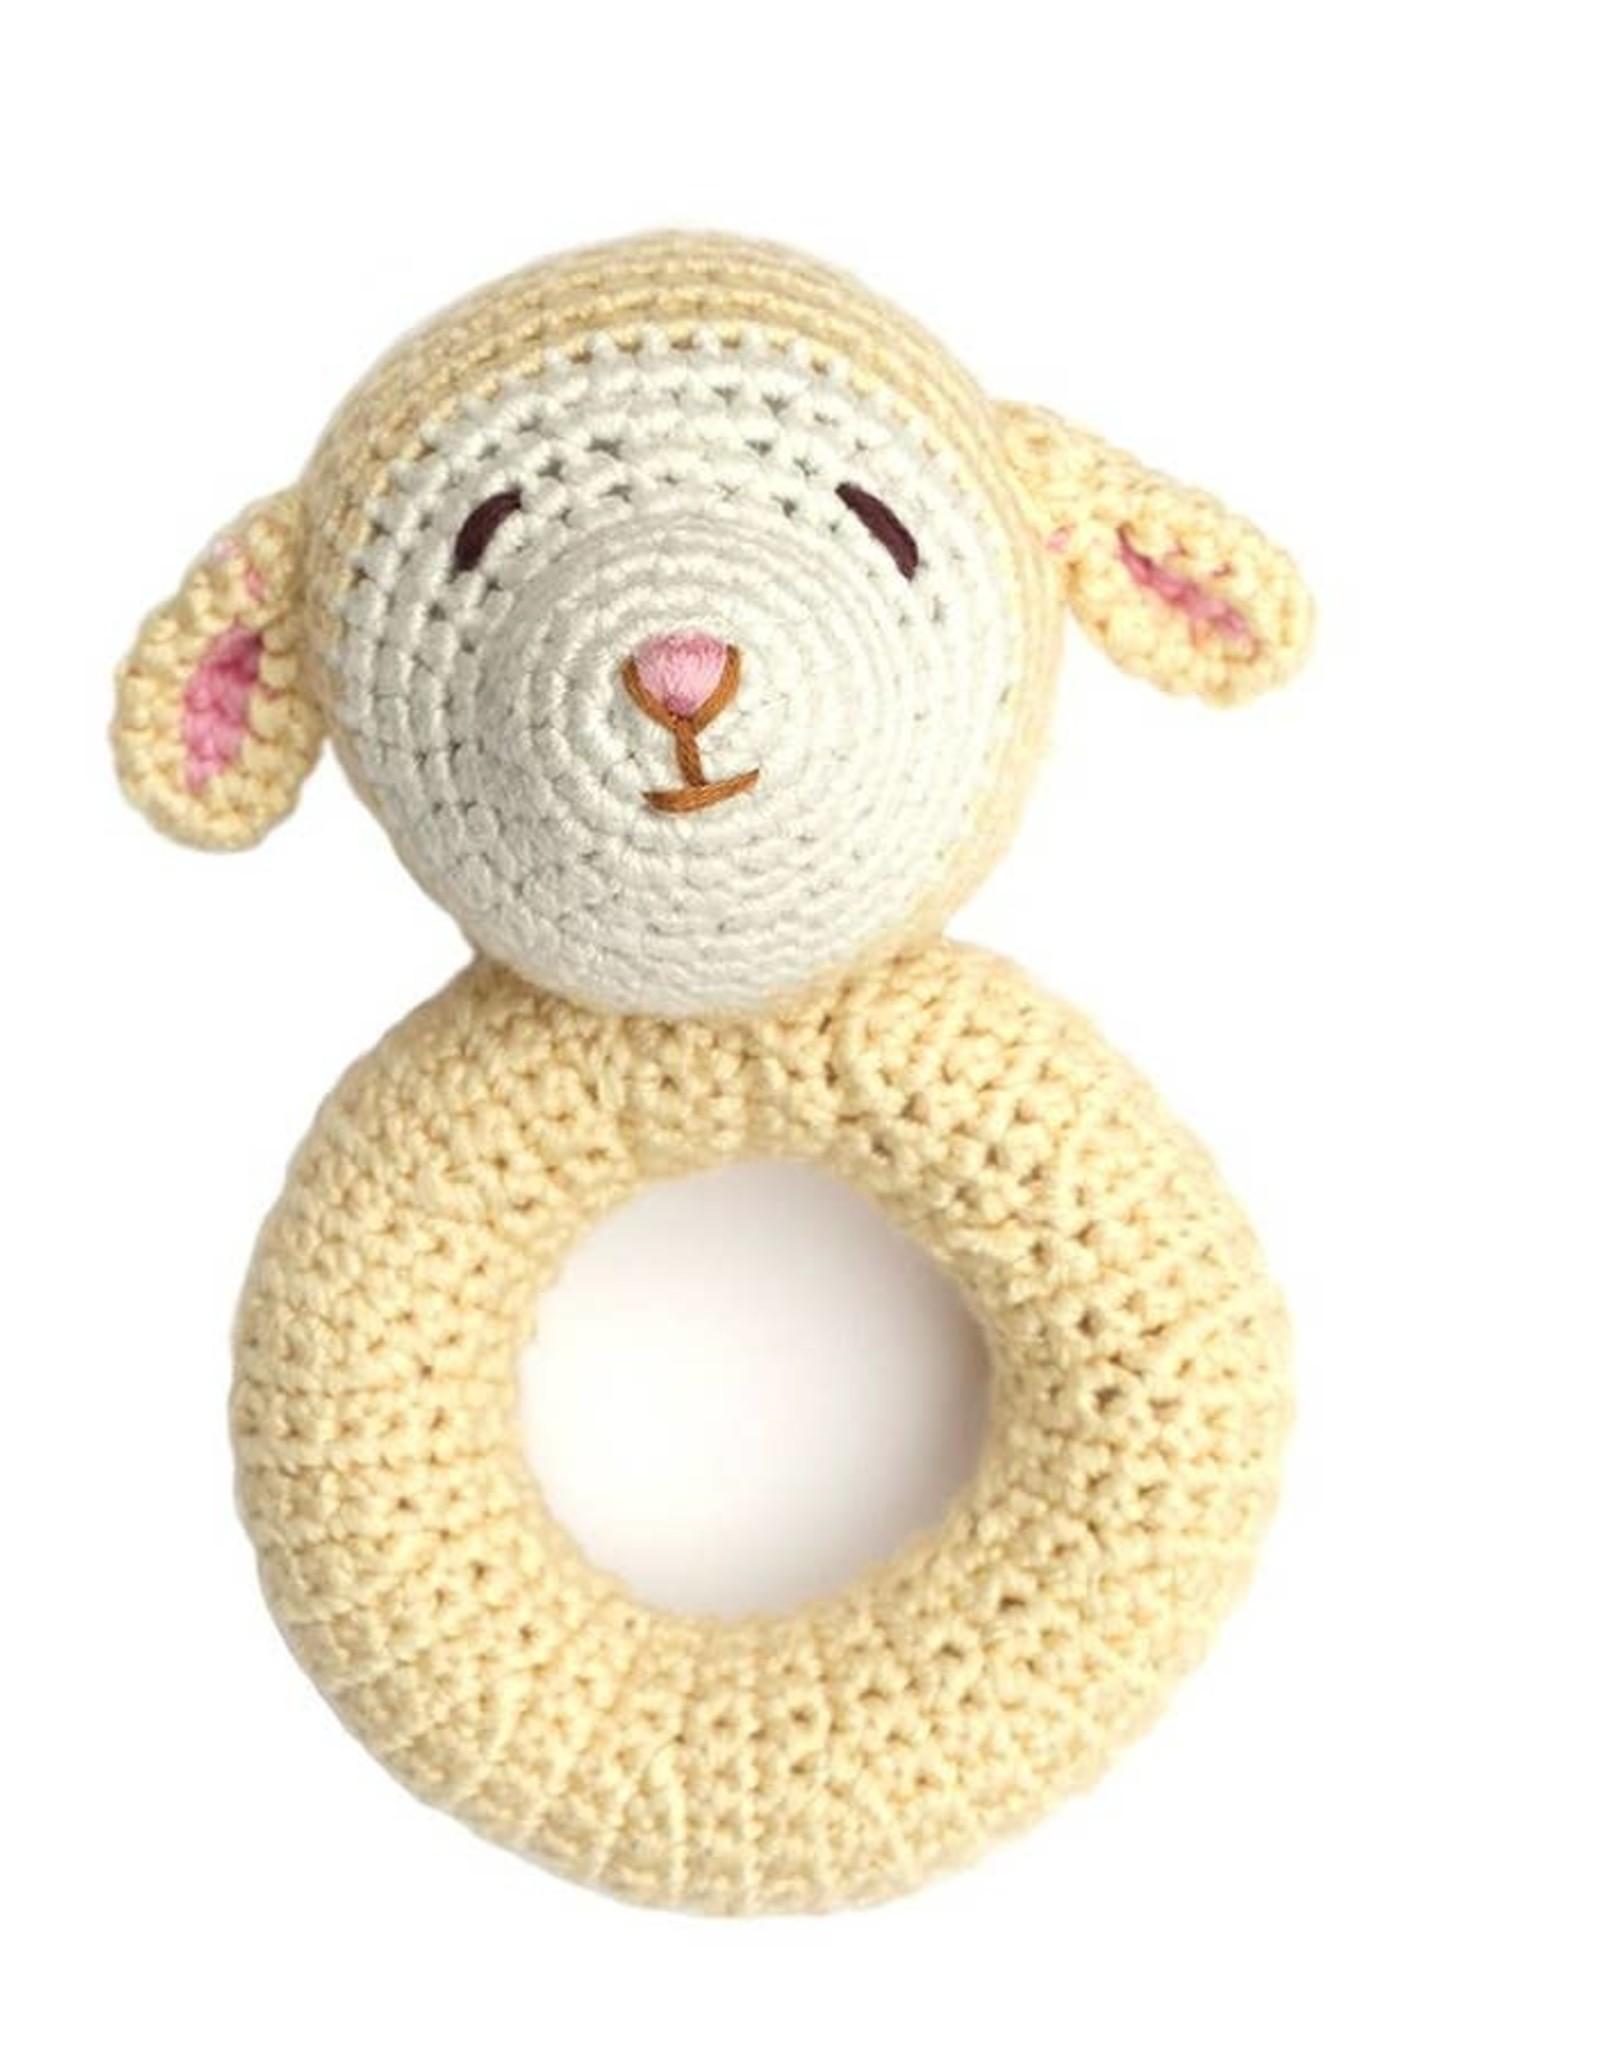 Cheengoo Cheengoo Organic Crochet Rattles